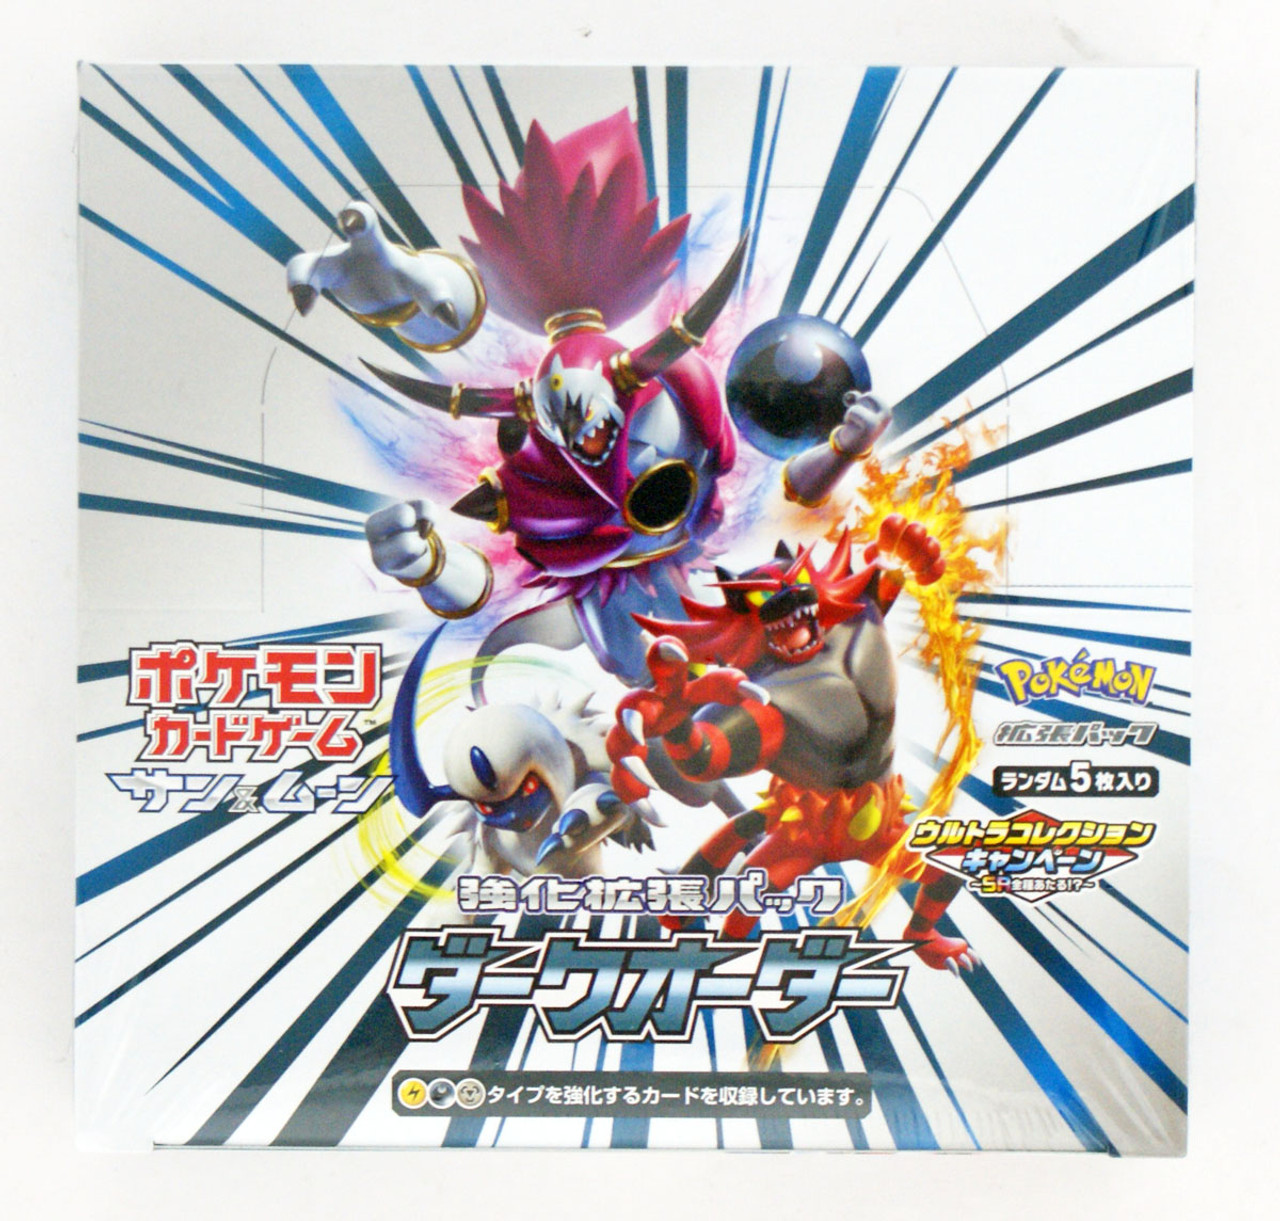 Japanese Pokemon Card Sun and Moon Explosive//Burst Impact SM8b Booster Pack